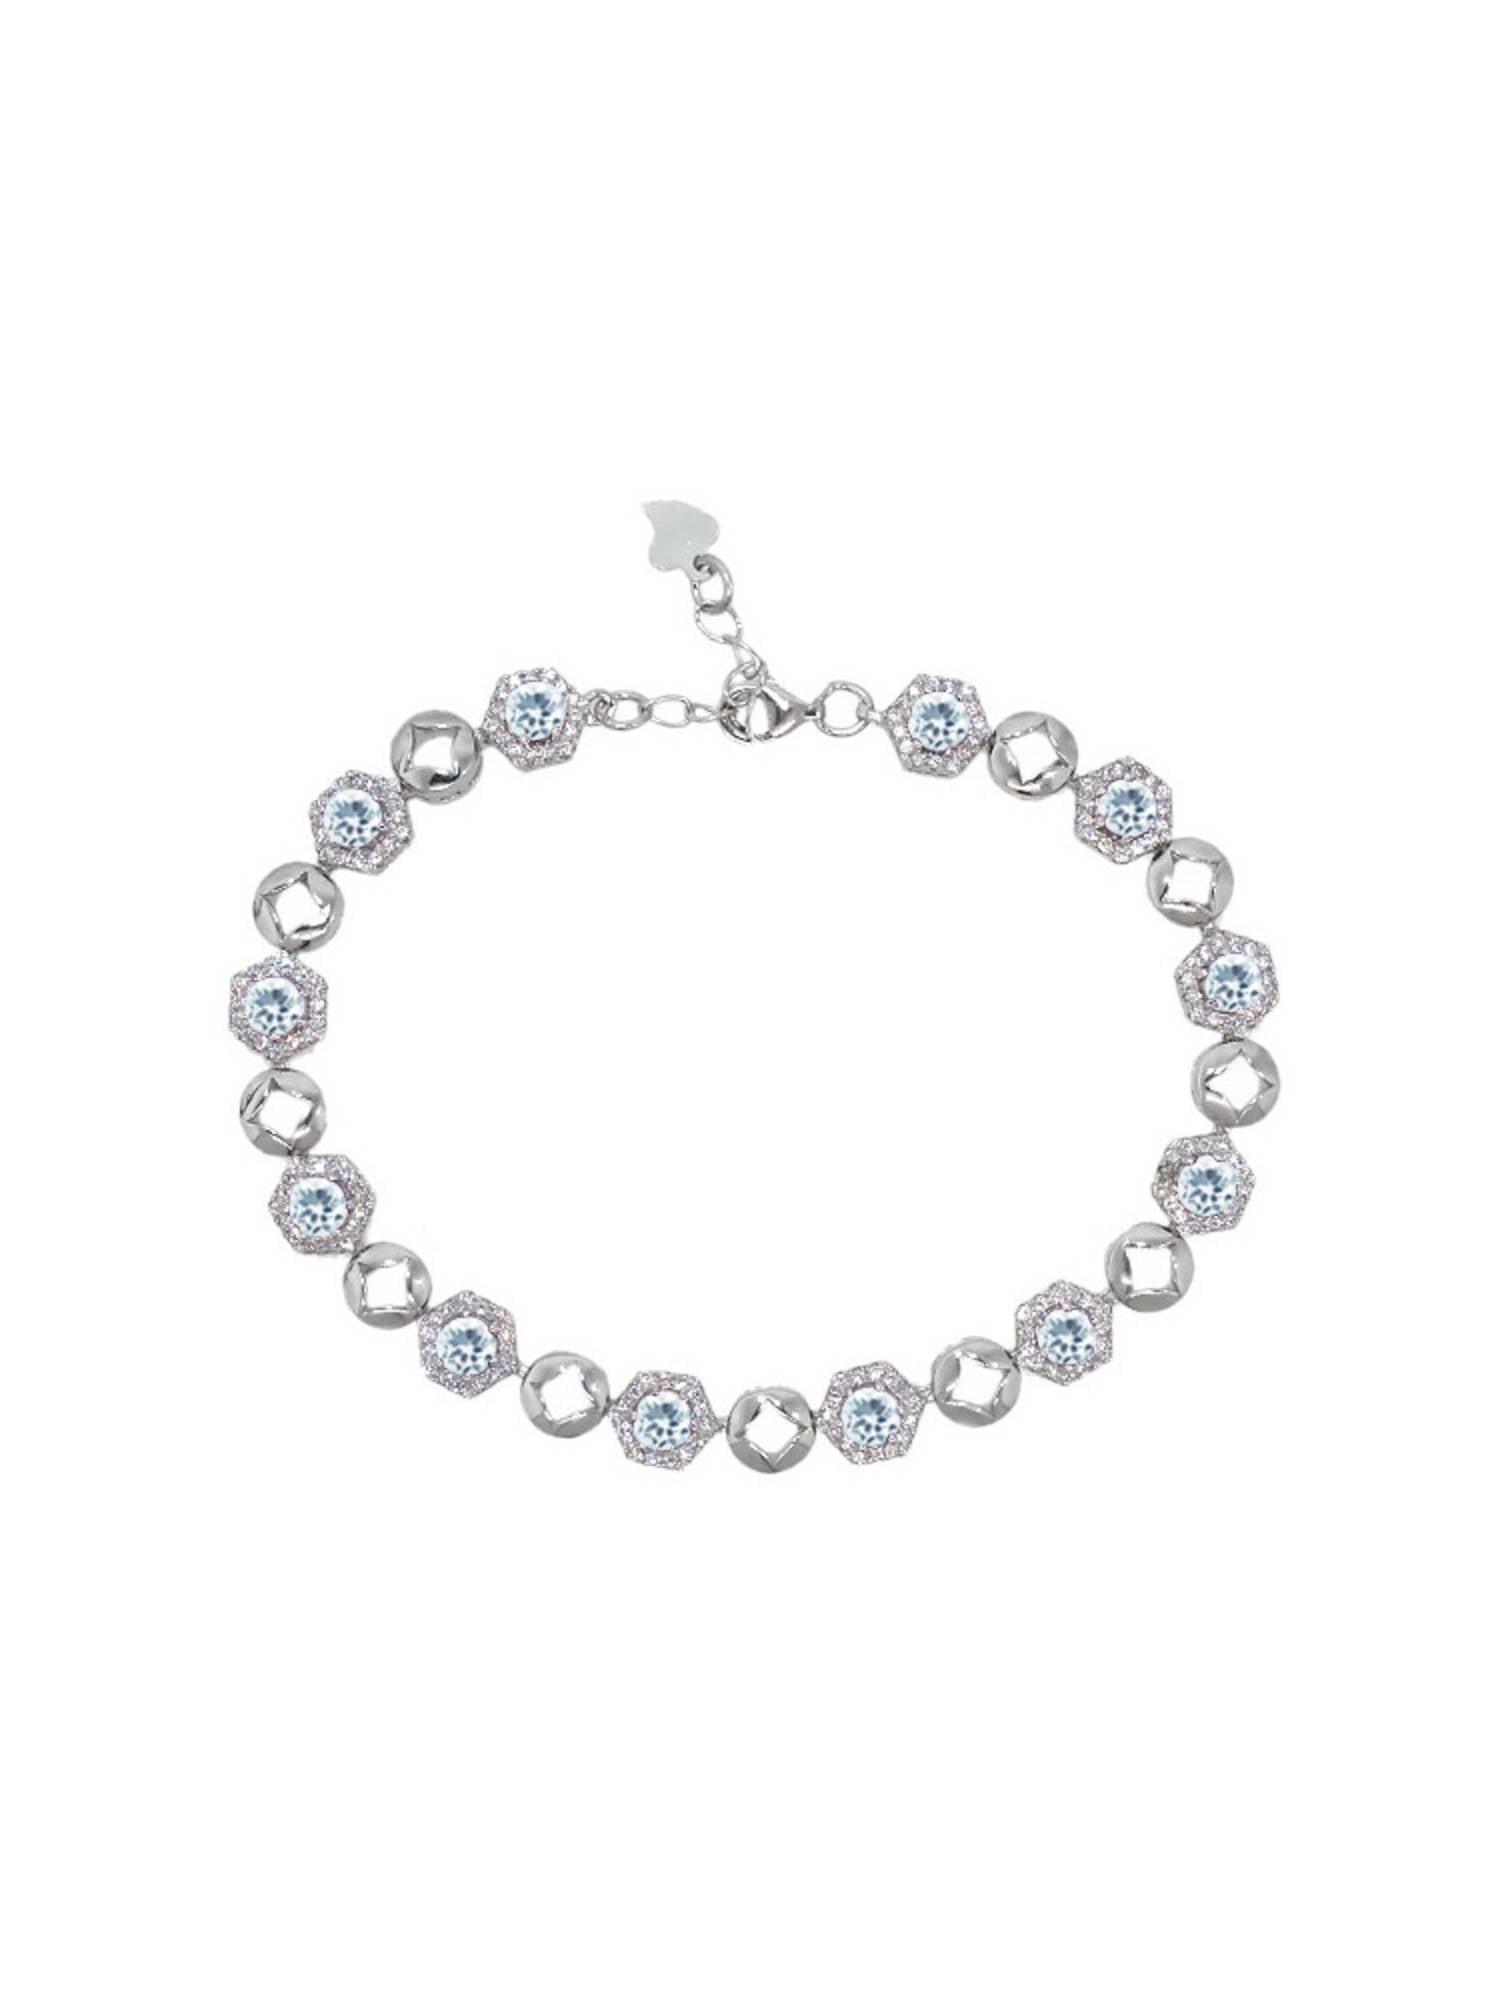 5.45 Ct Round Sky Blue Aquamarine 925 Sterling Silver Bracelet by